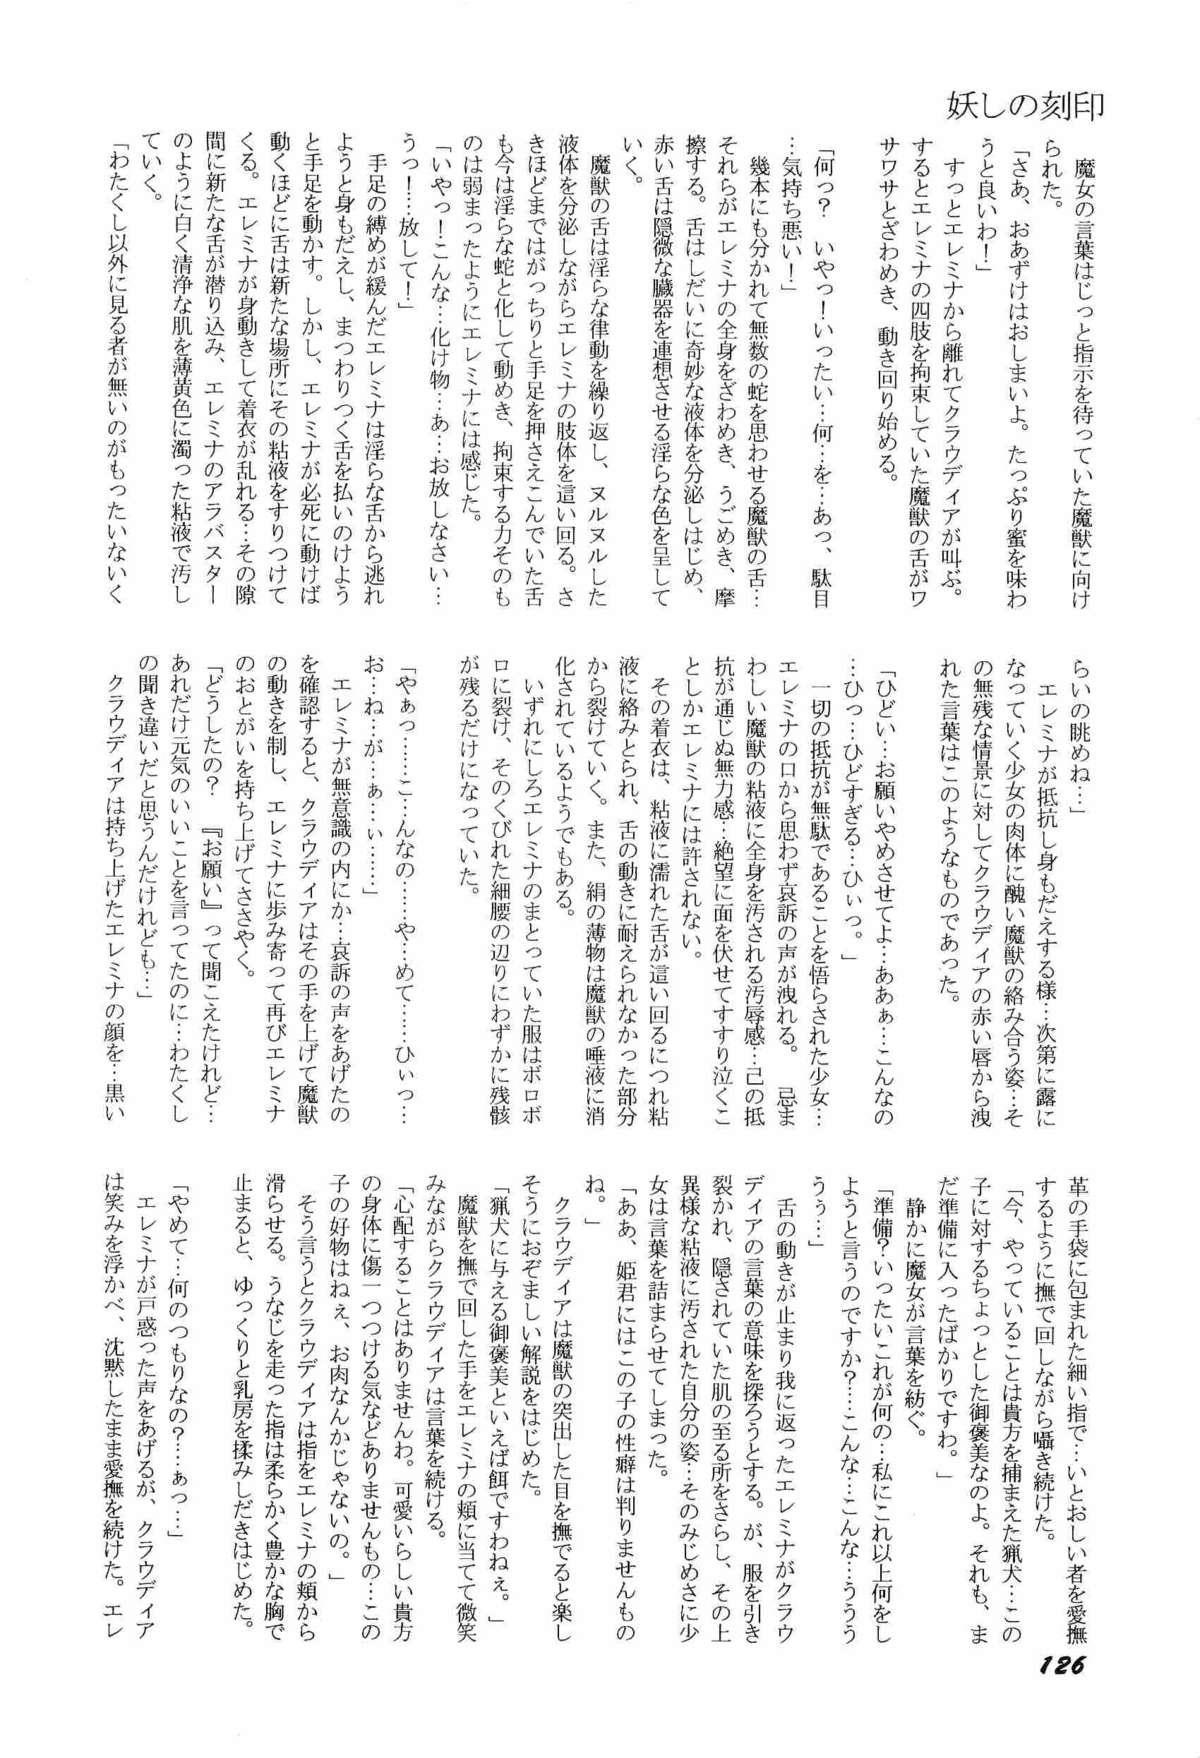 Bisyoujo Anthology '93 jyoukan 128